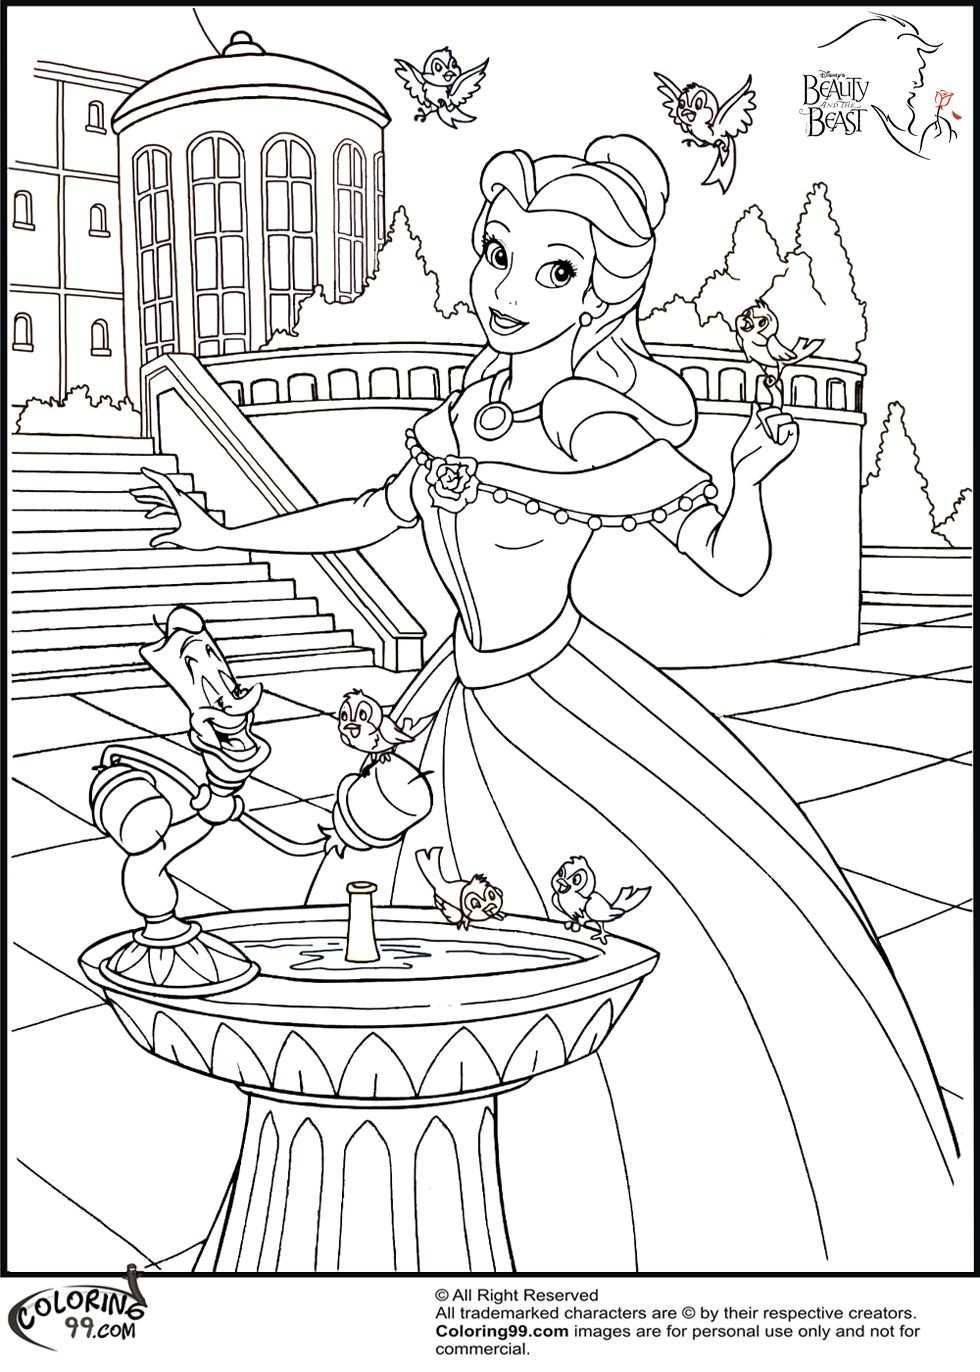 Princess Belle Coloring Pages Home Disney Disney Princess